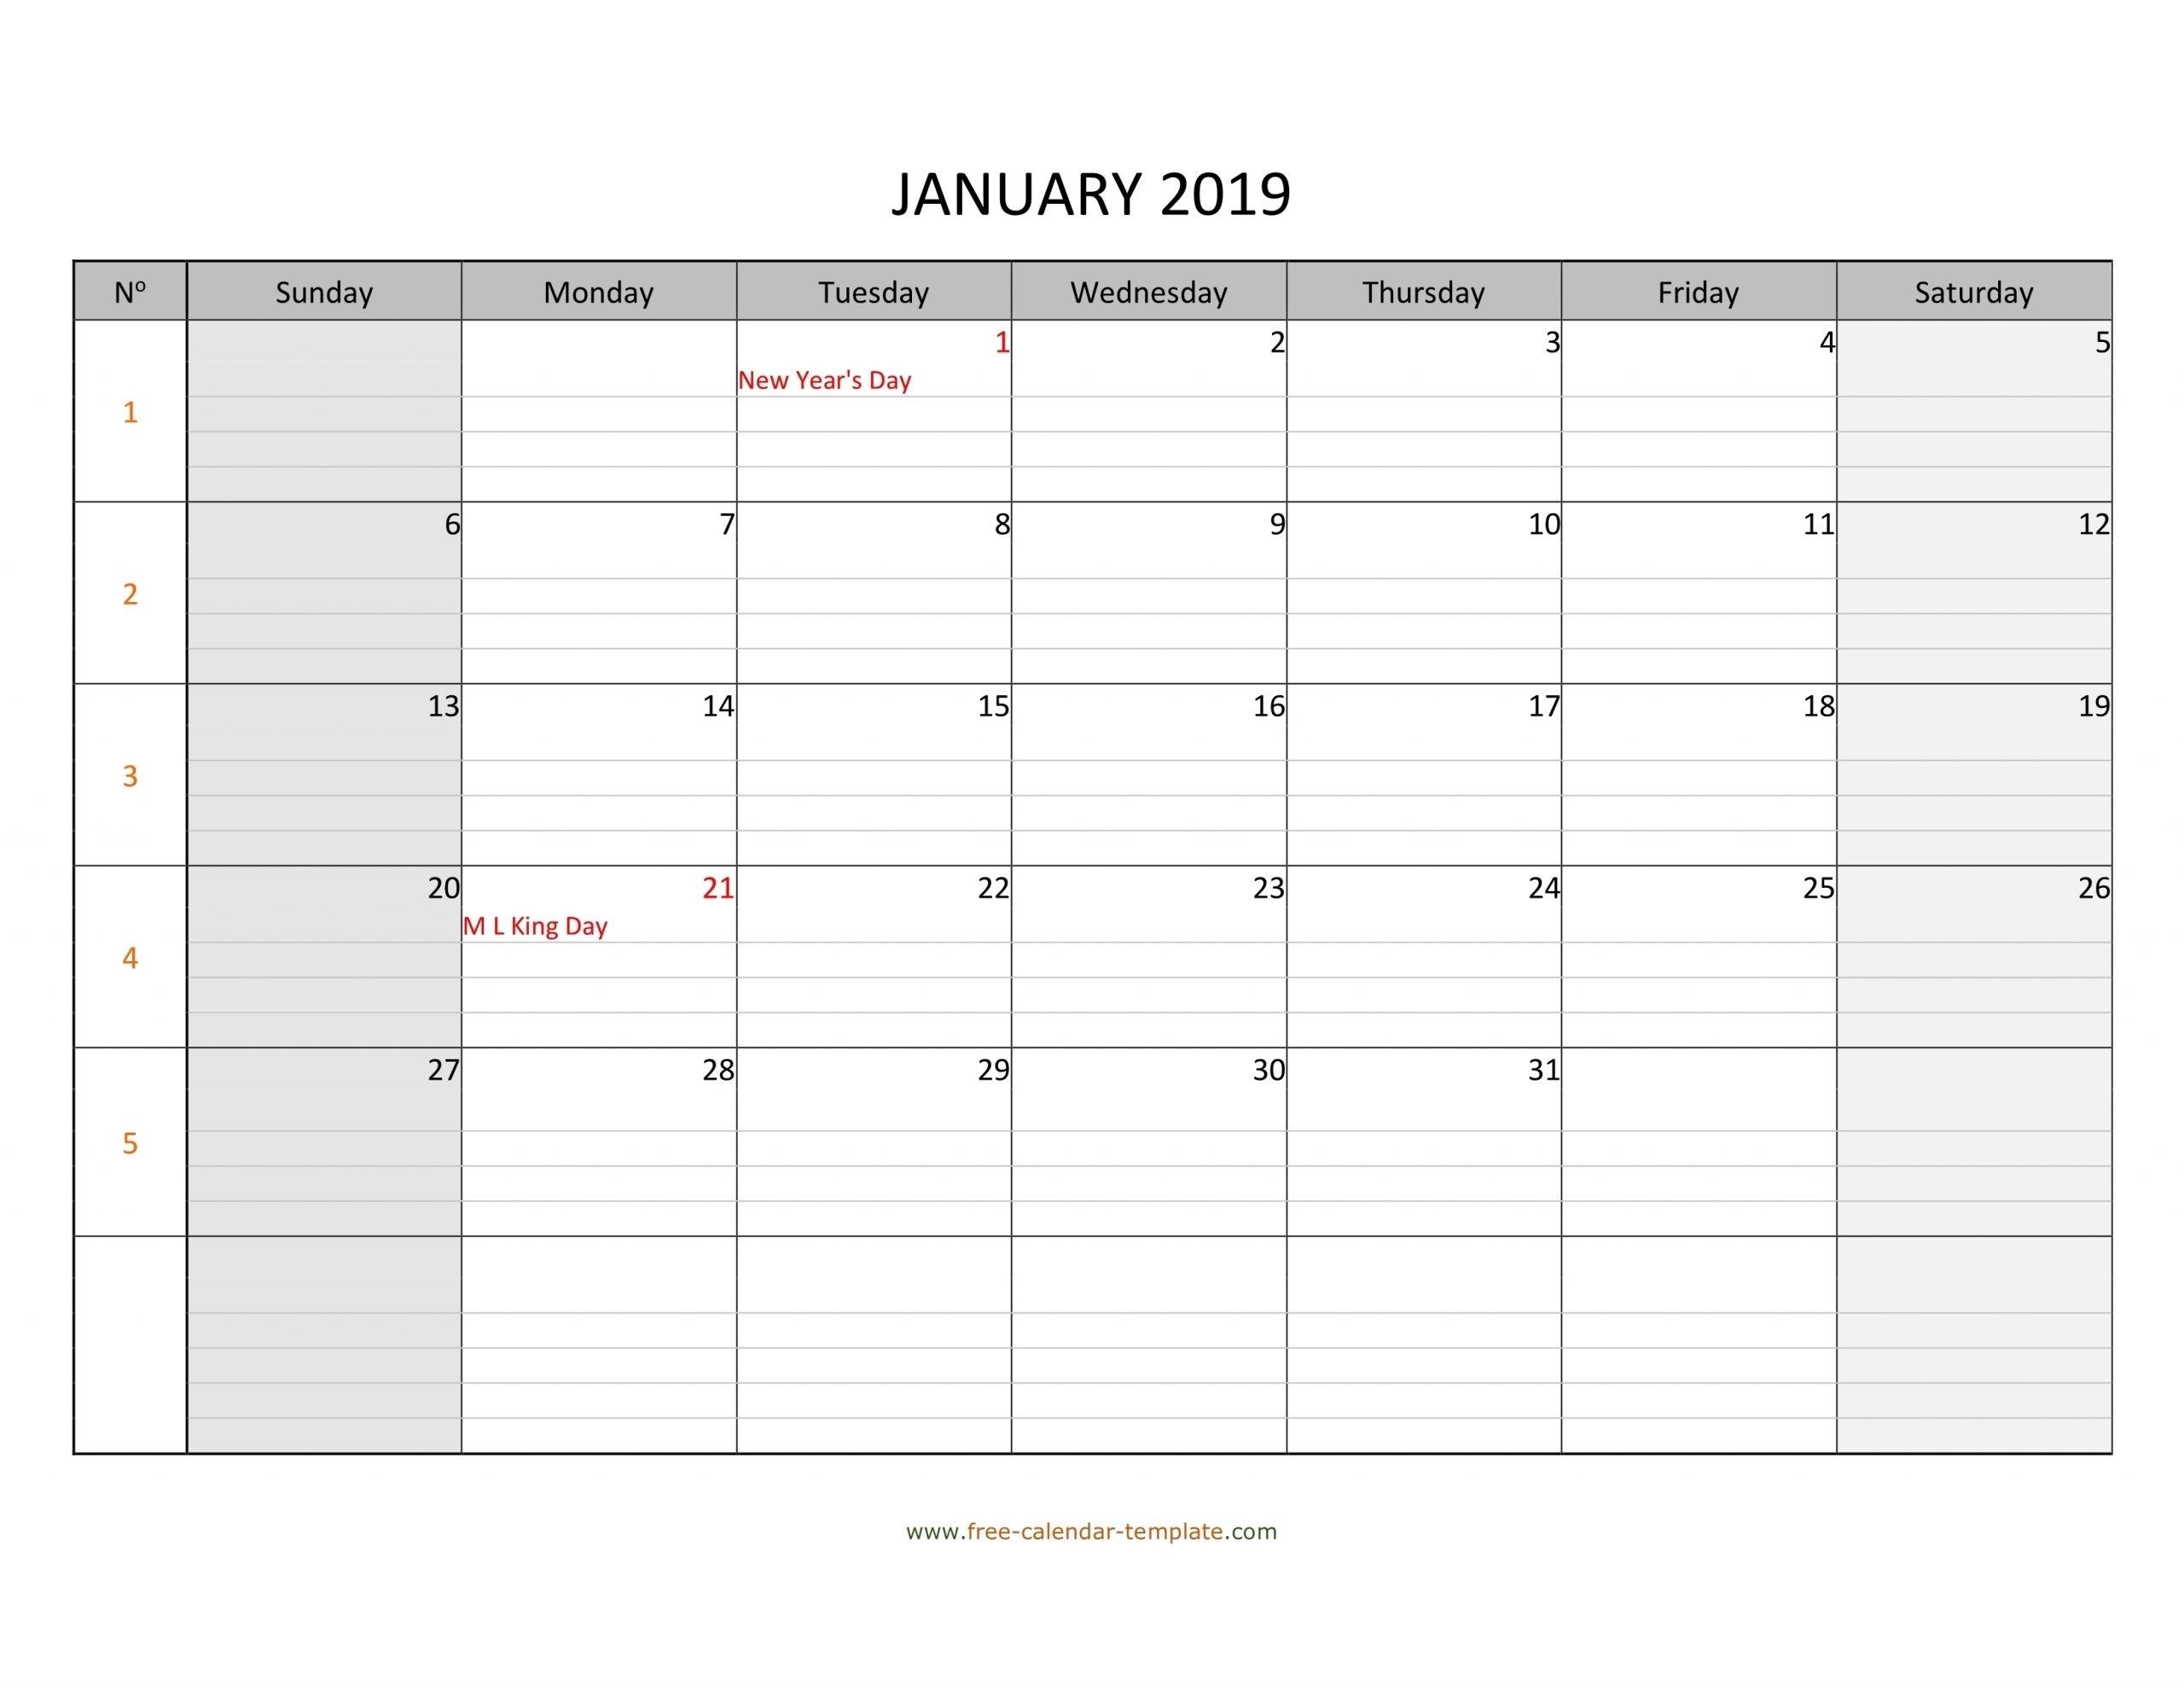 Get Free Printable Calendars No Download